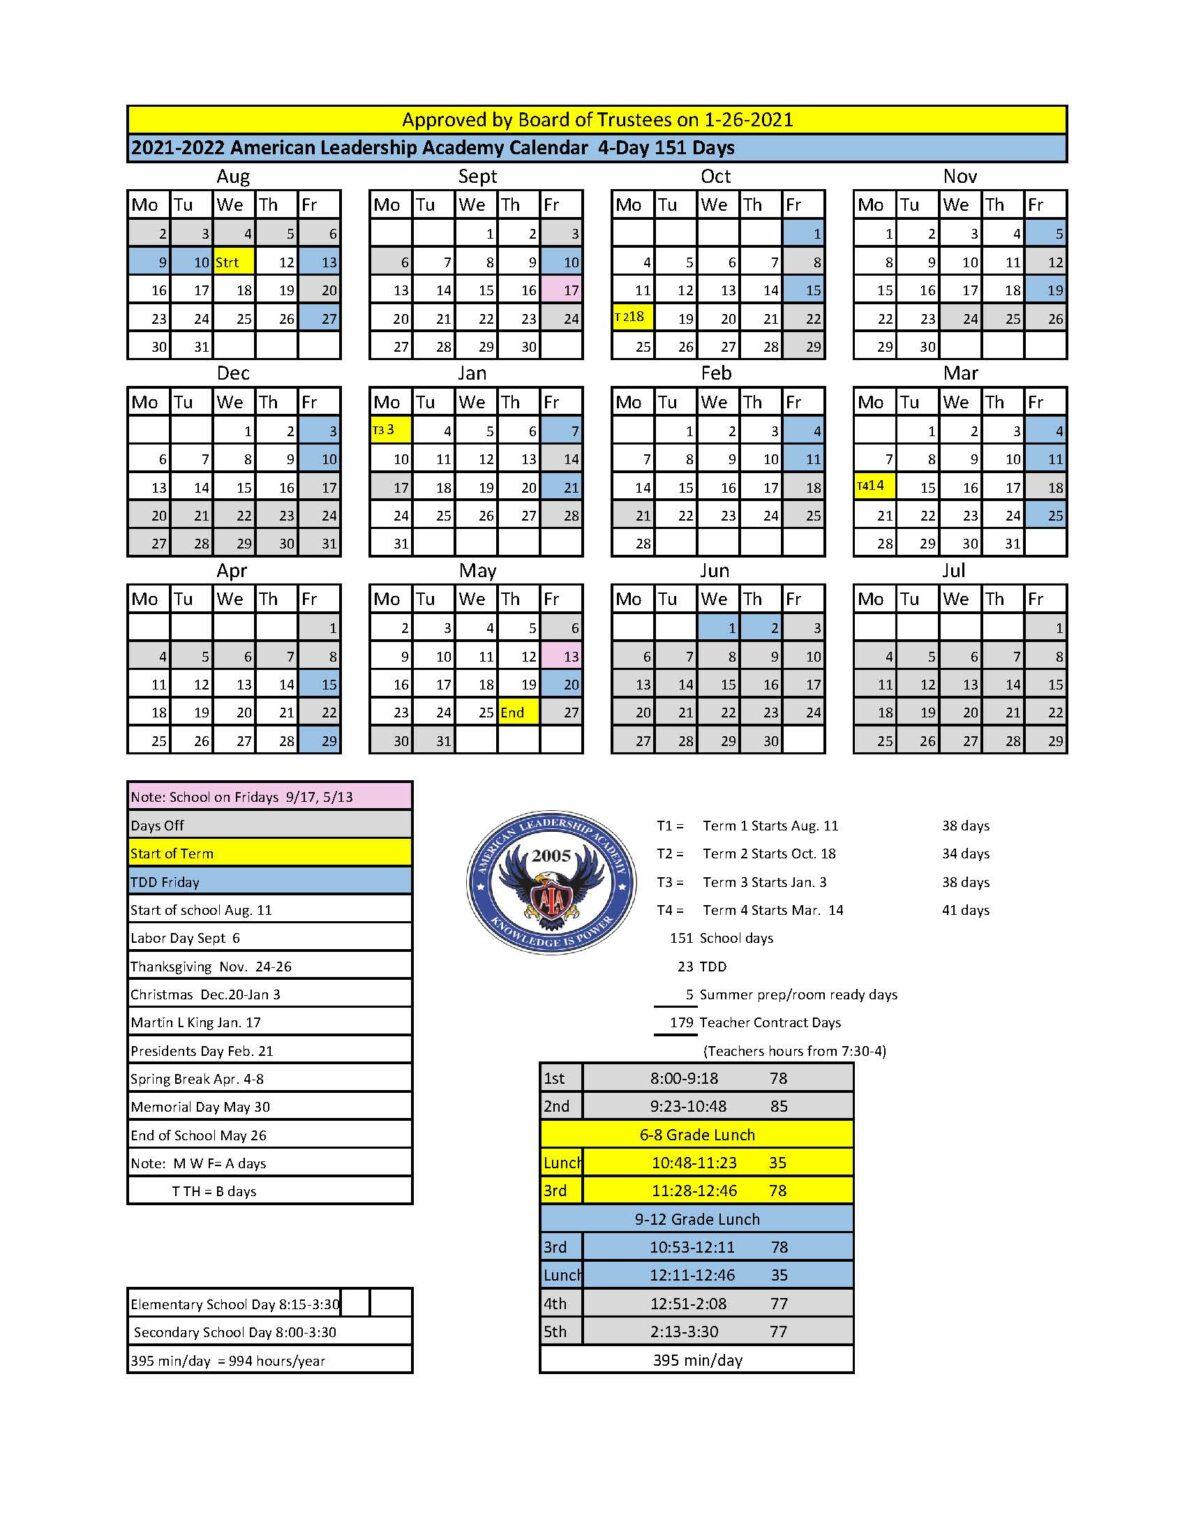 2021-2022 School Calendar | American Leadership Academy